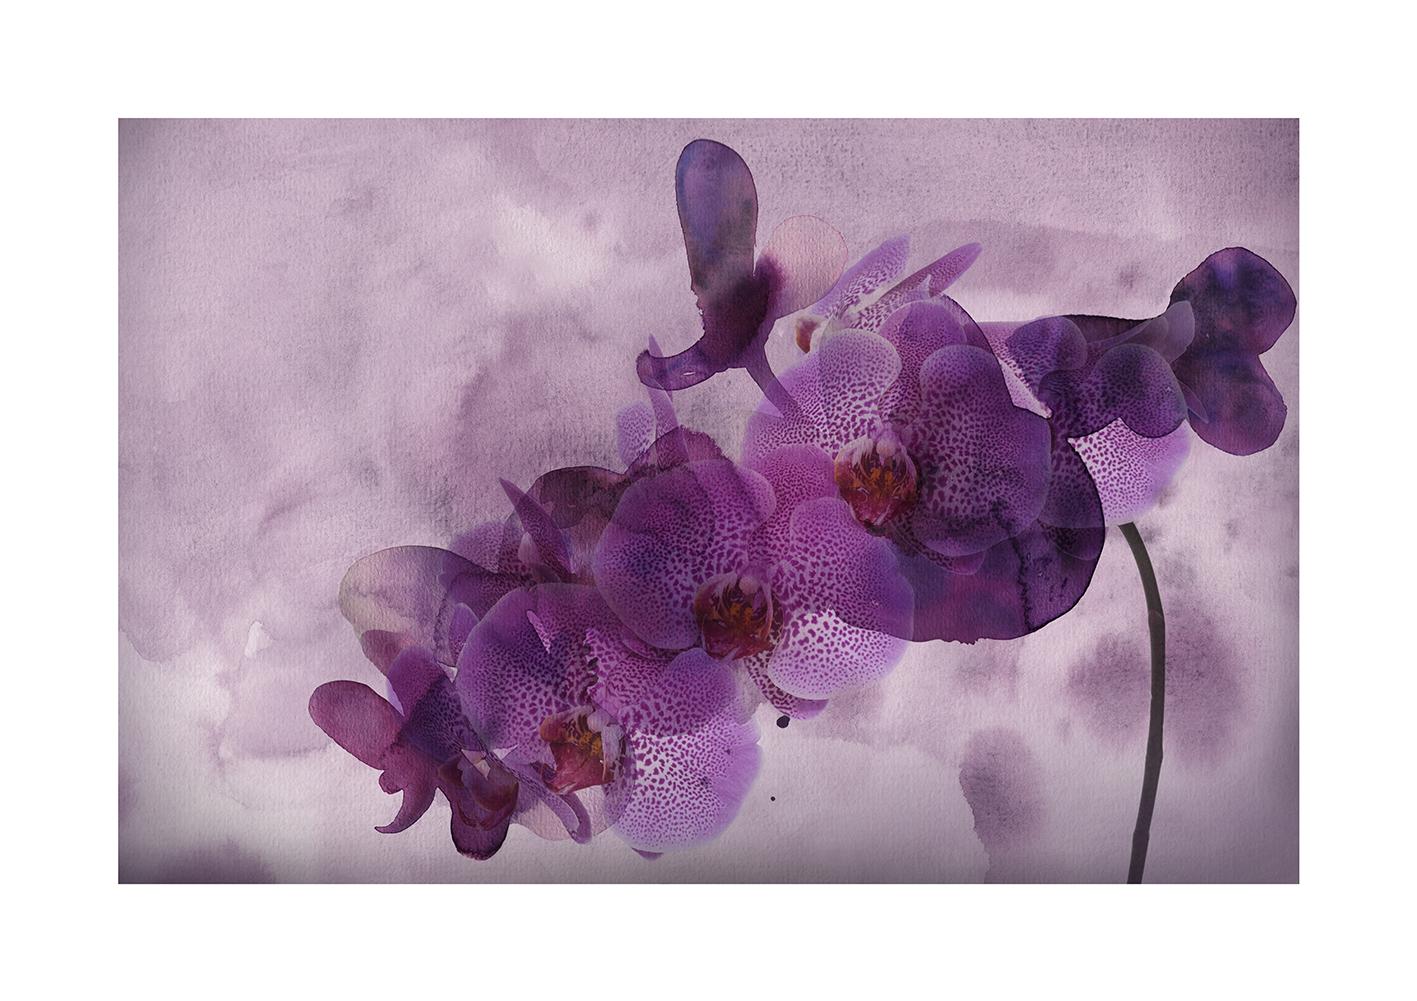 Violet Undertones Limited Edition Print